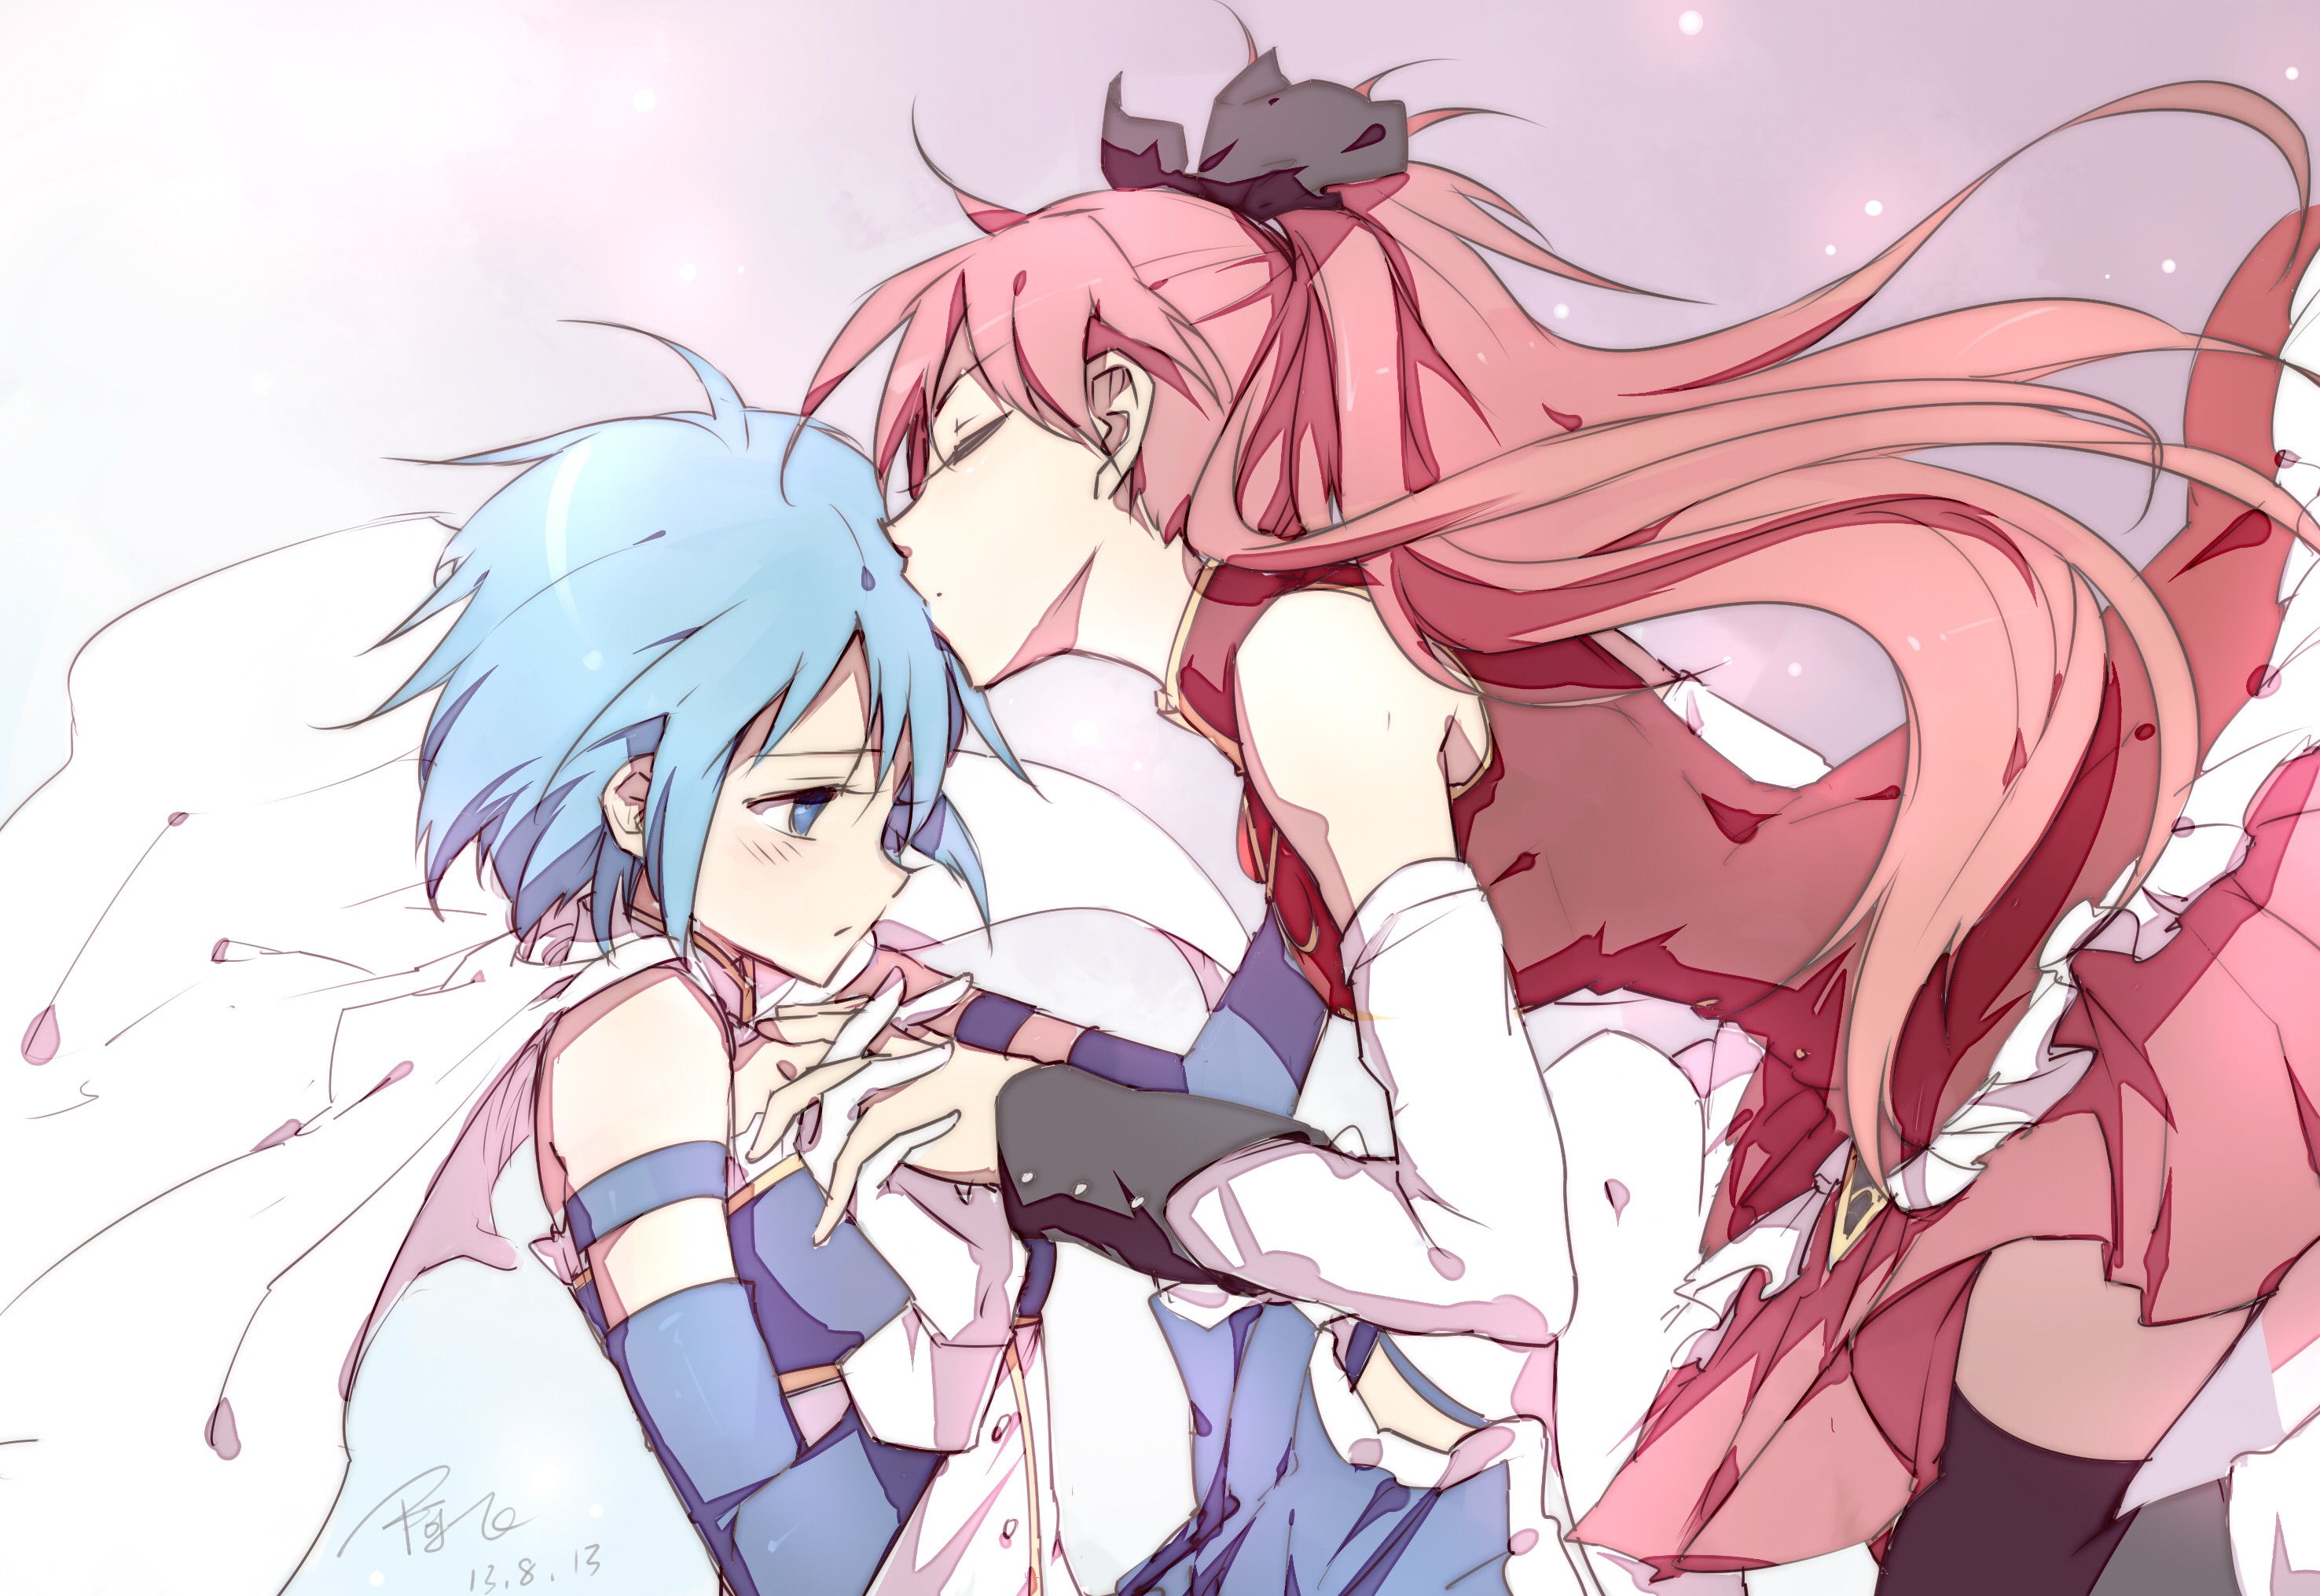 long hair blue hair anime girls mahou shoujo madoka magica anime miki sayaka sakura kyouko kissing